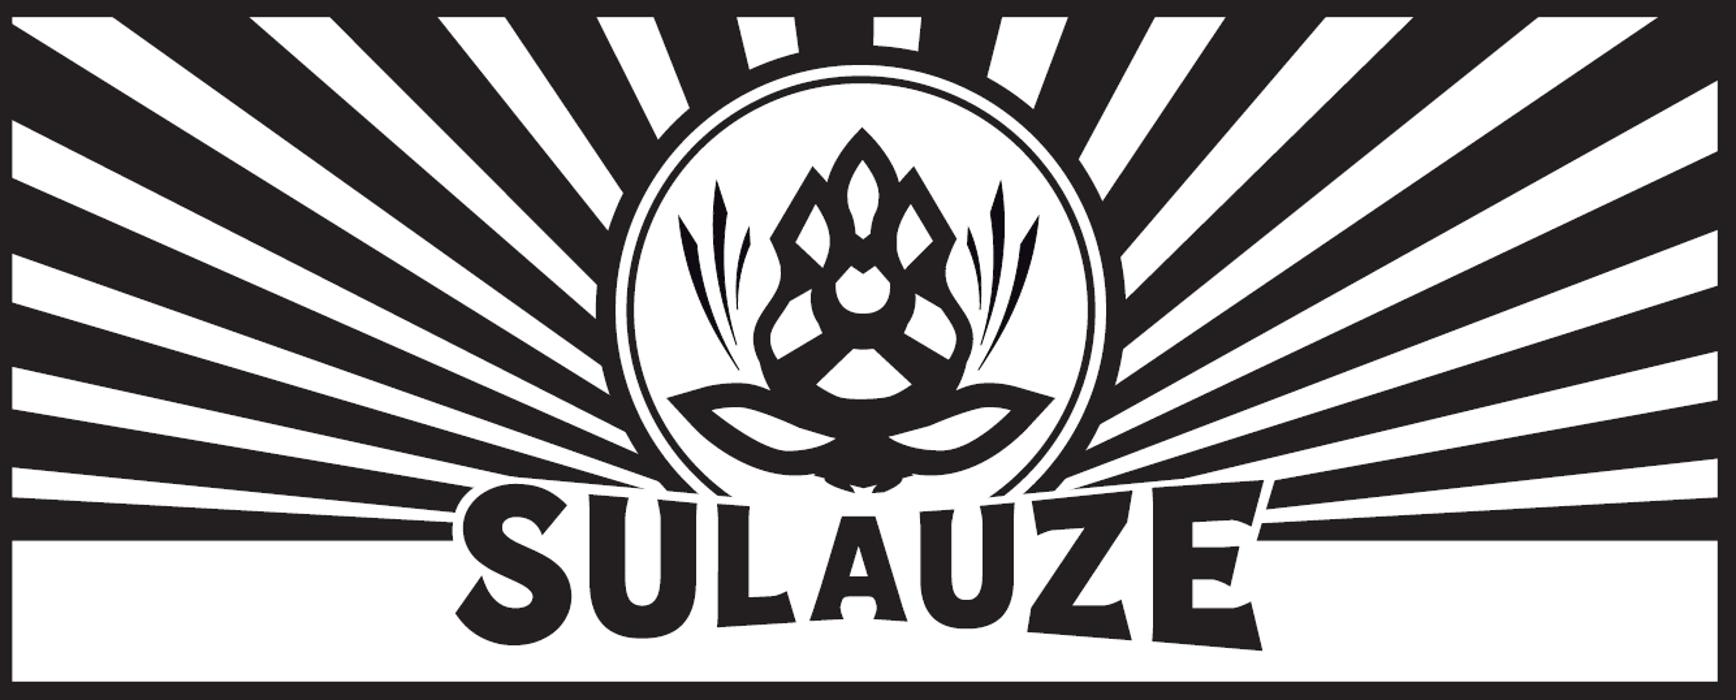 Brasserie de Sulauze brasserie